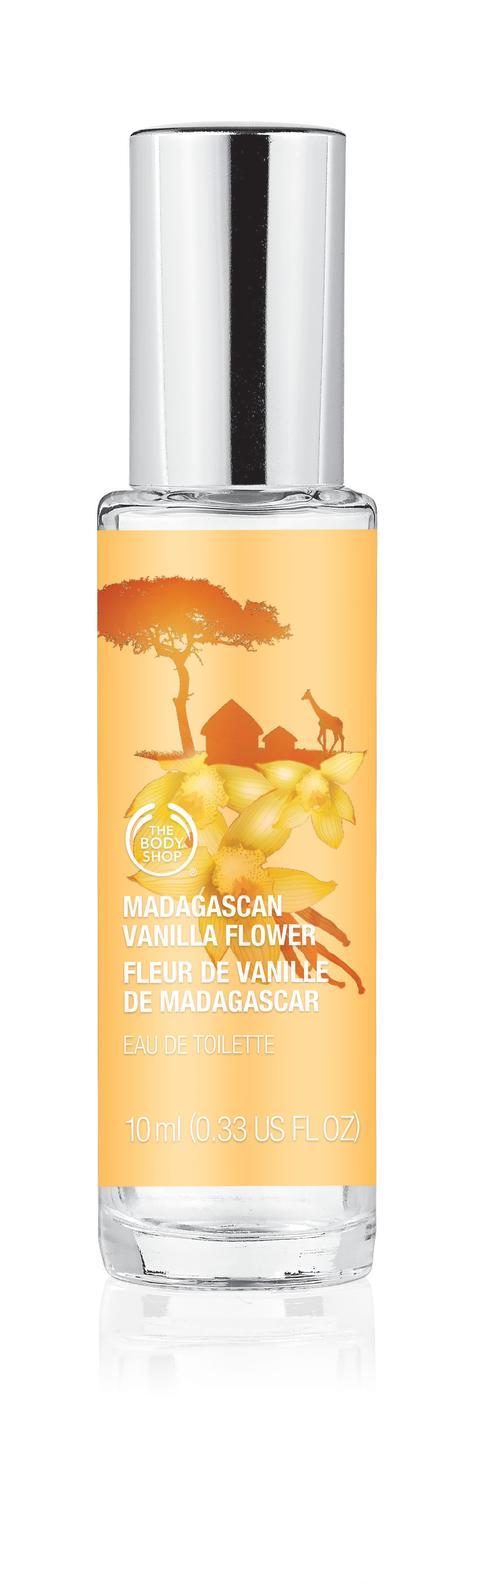 Madagascan Vanilla Flower Mini EdT